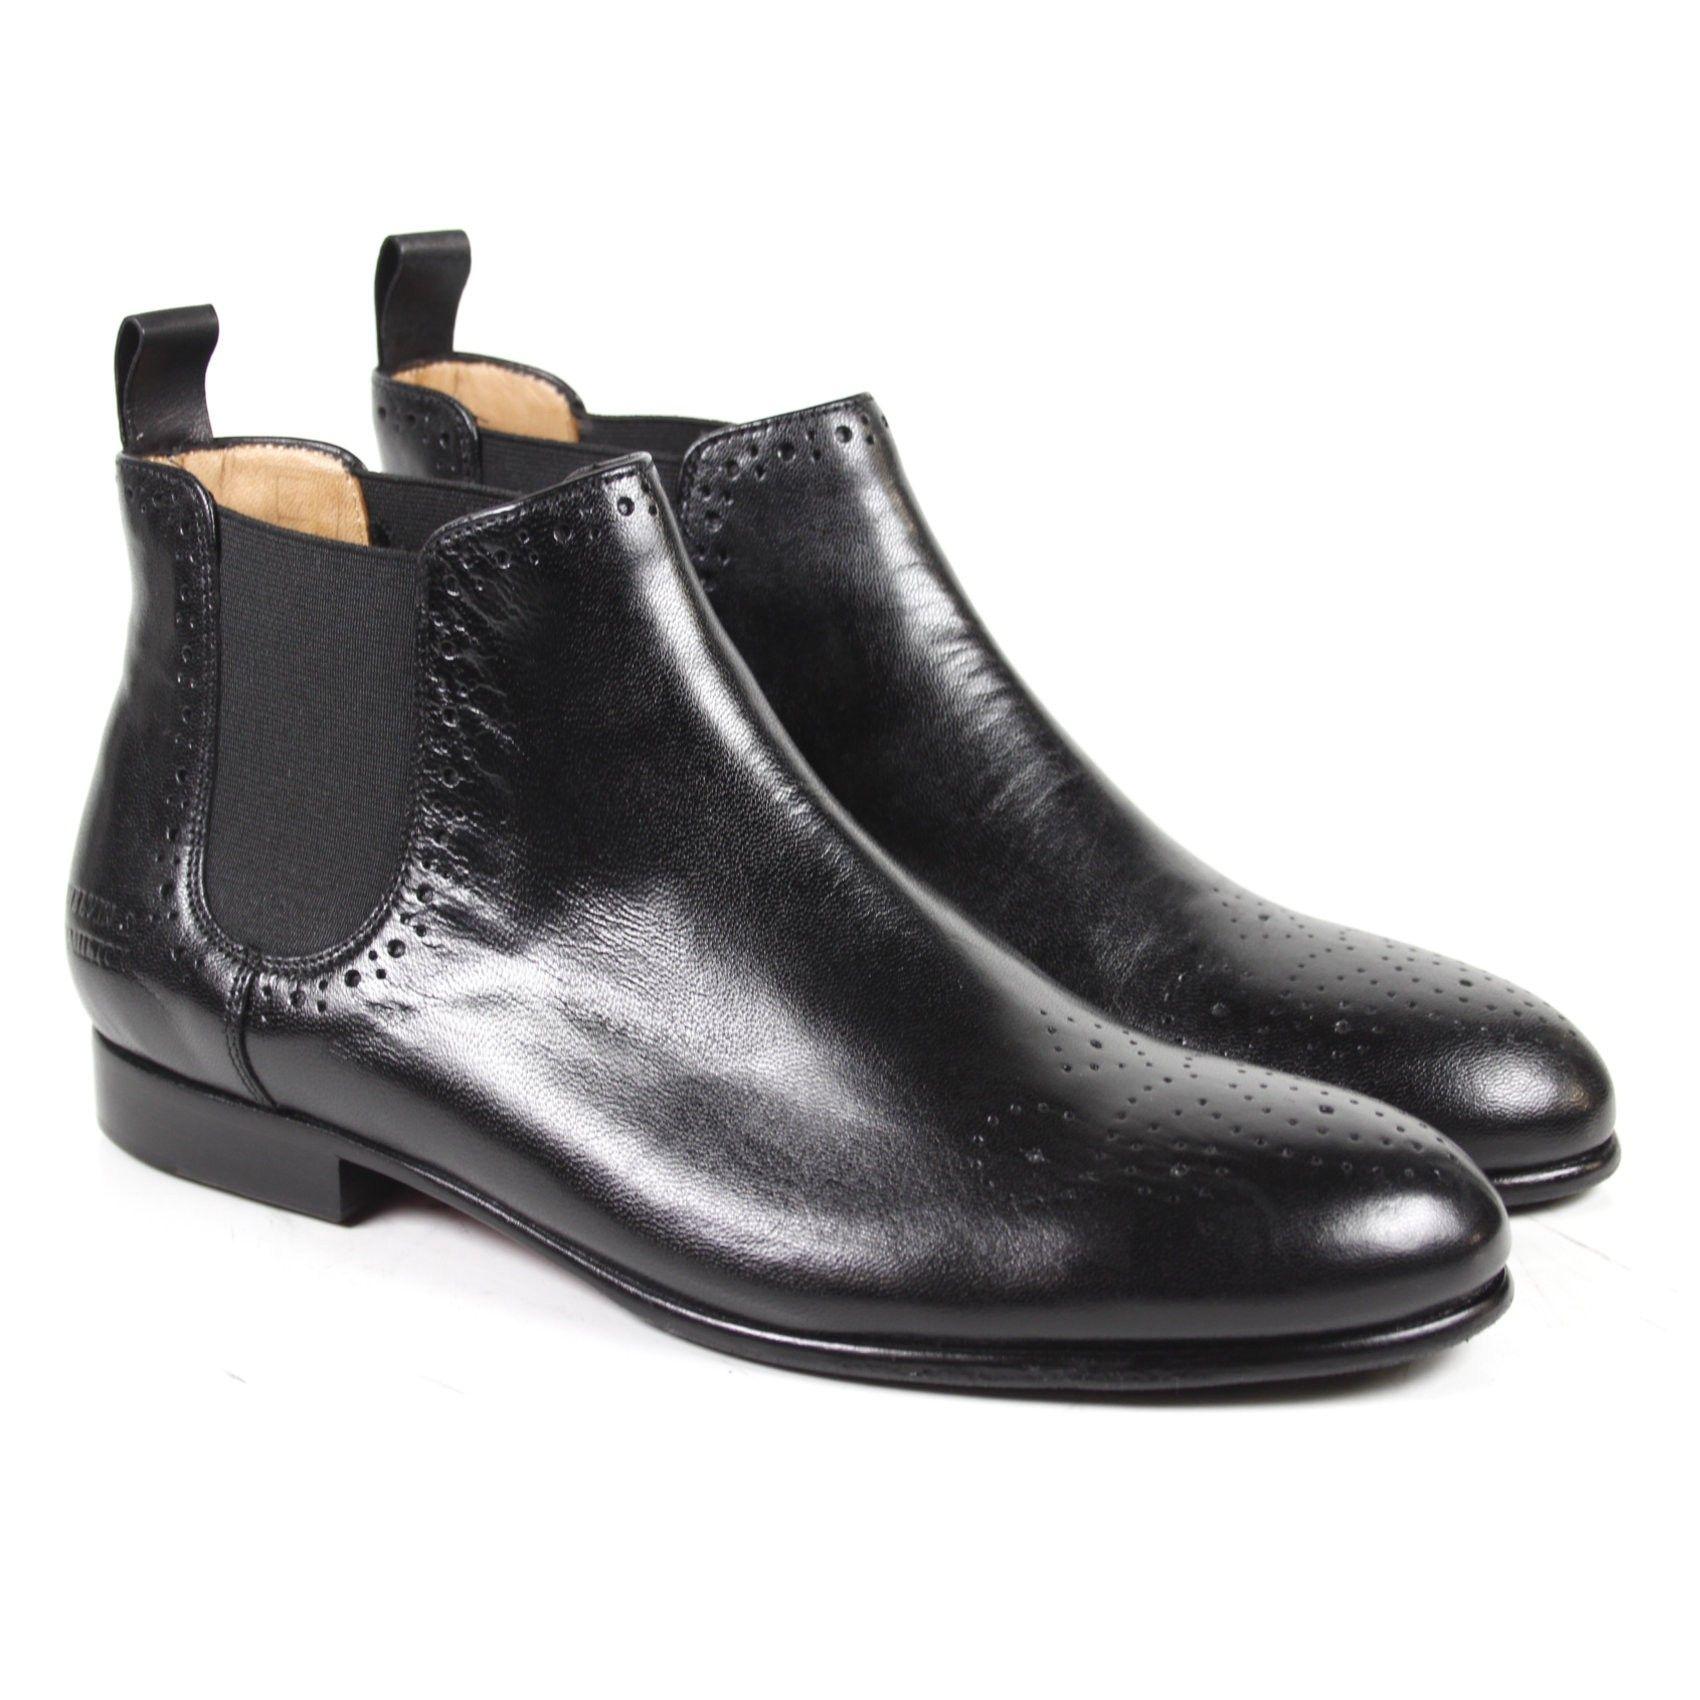 Melvin & Hamilton SALLY - Ankle boots - salerno p1EhN1